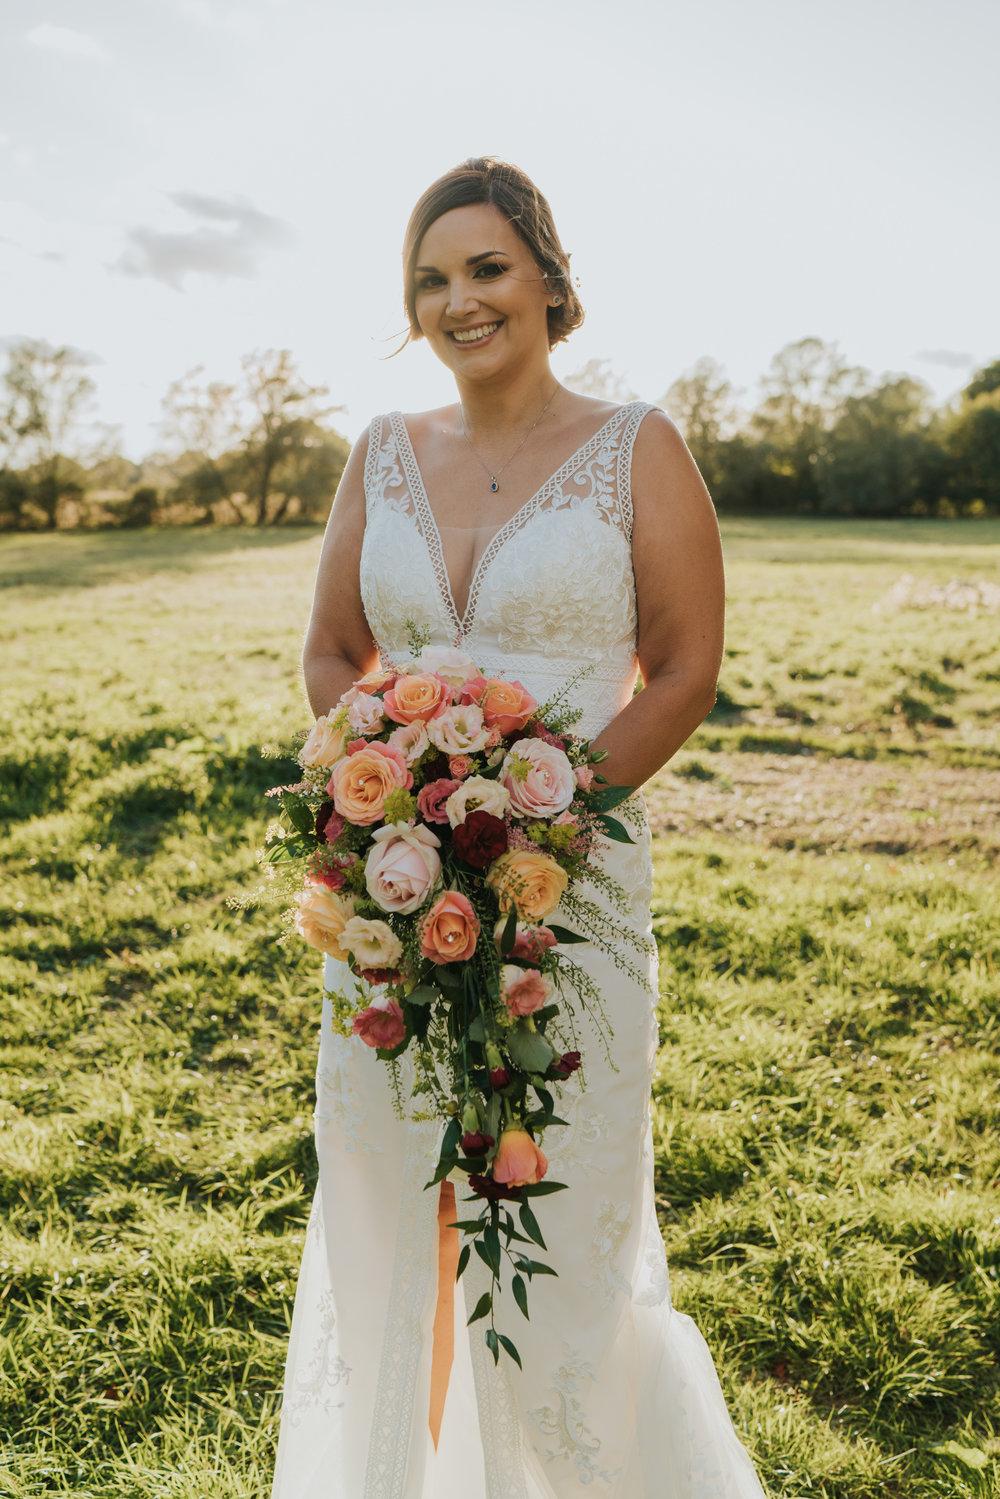 sophie-mark-newland-hall-boho-wedding-grace-elizanbeth-alternative-wedding-photographer-colchester-essex-norfolk-suffolk-devon (134 of 161).jpg